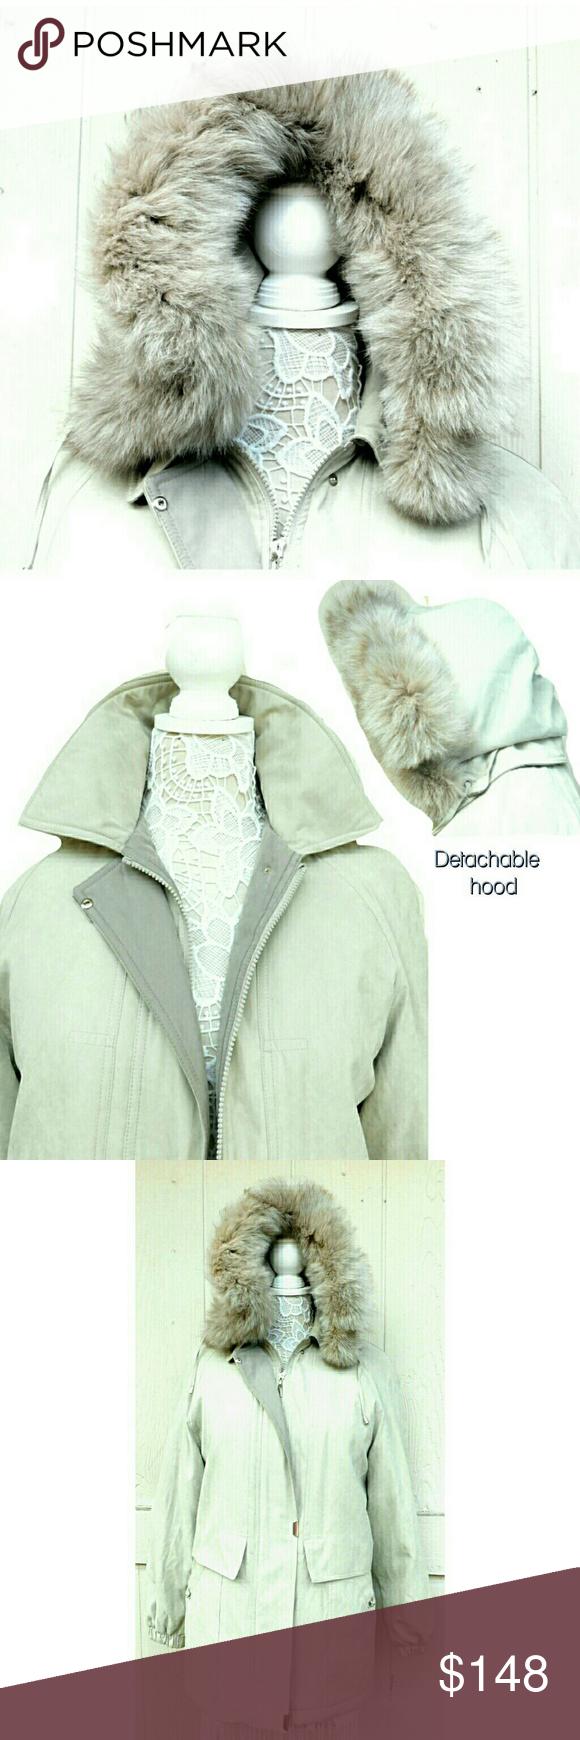 Glamorous Izzi Outerwear Fox Fur Hooded Jacket Glamorous Izzi Outerwear Fox Fur Hooded Jacket Pre Loved Euc Rn 38 Fur Hood Jacket Clothes Design Fashion Tips [ 1740 x 580 Pixel ]